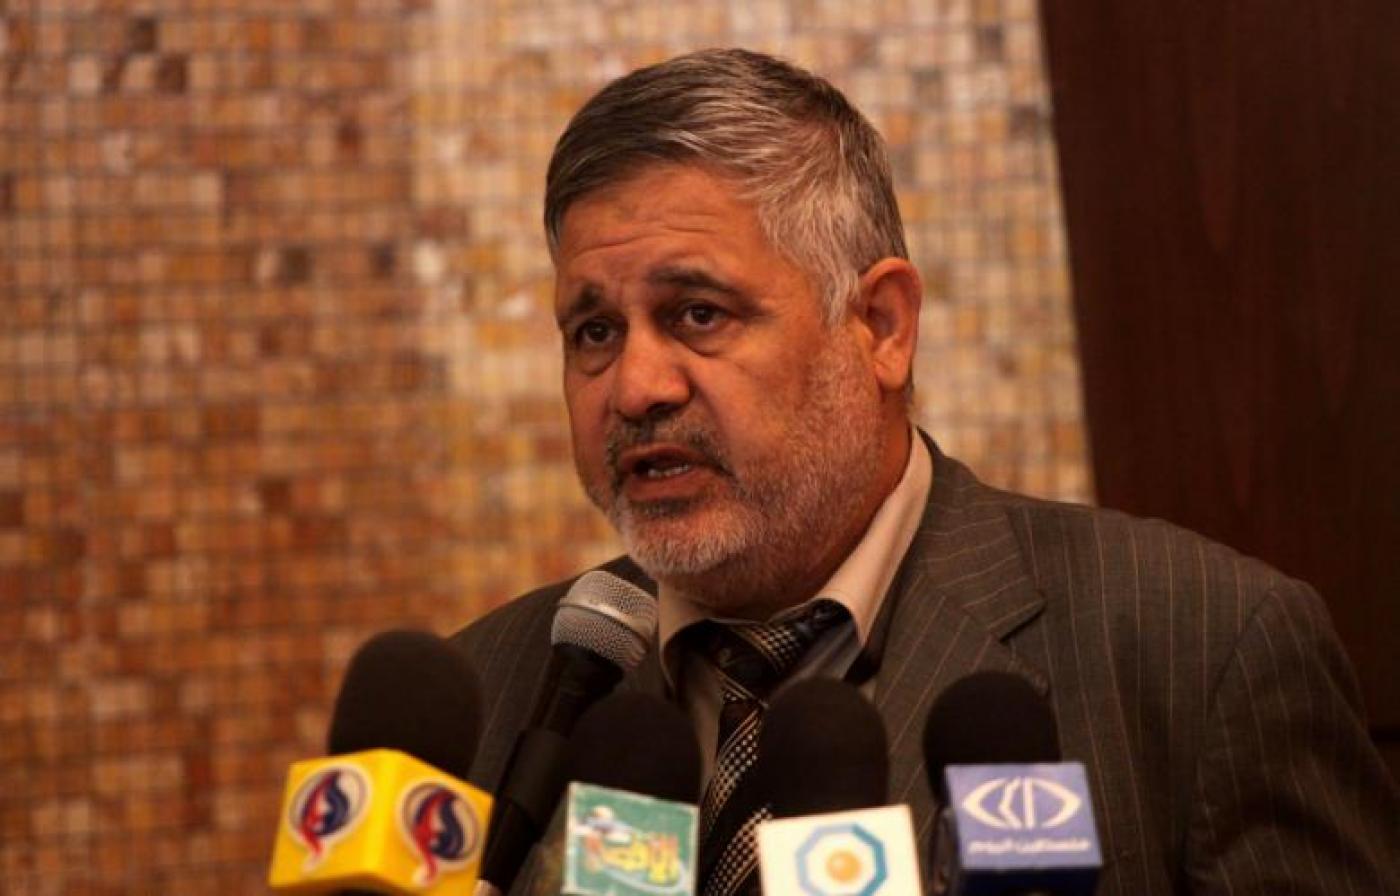 Hamas leader Ahmed Yousef